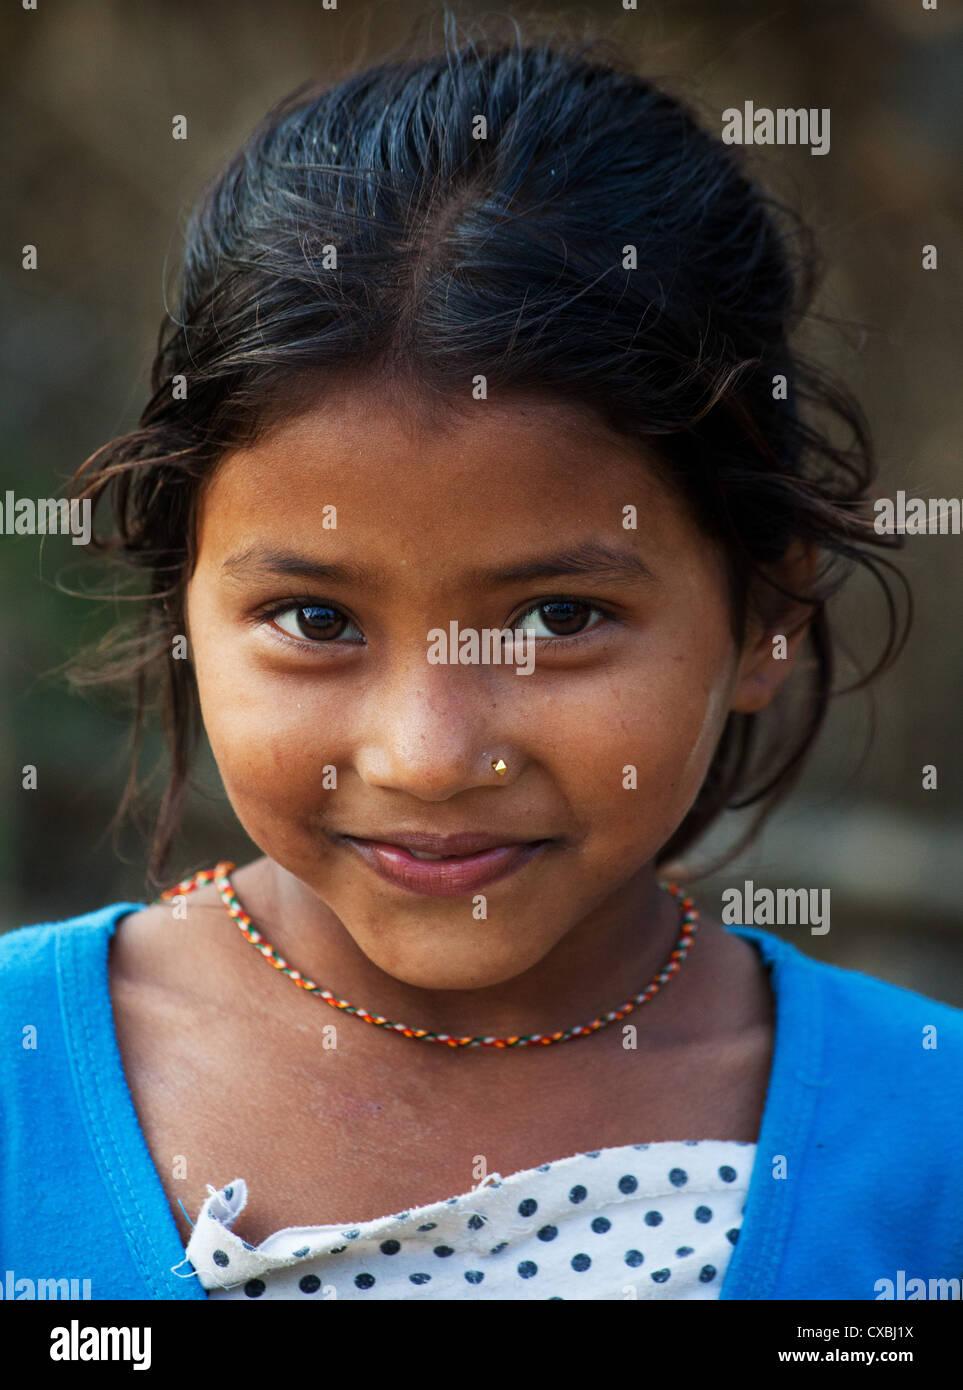 loveawake gratis online dating nepalese servizio